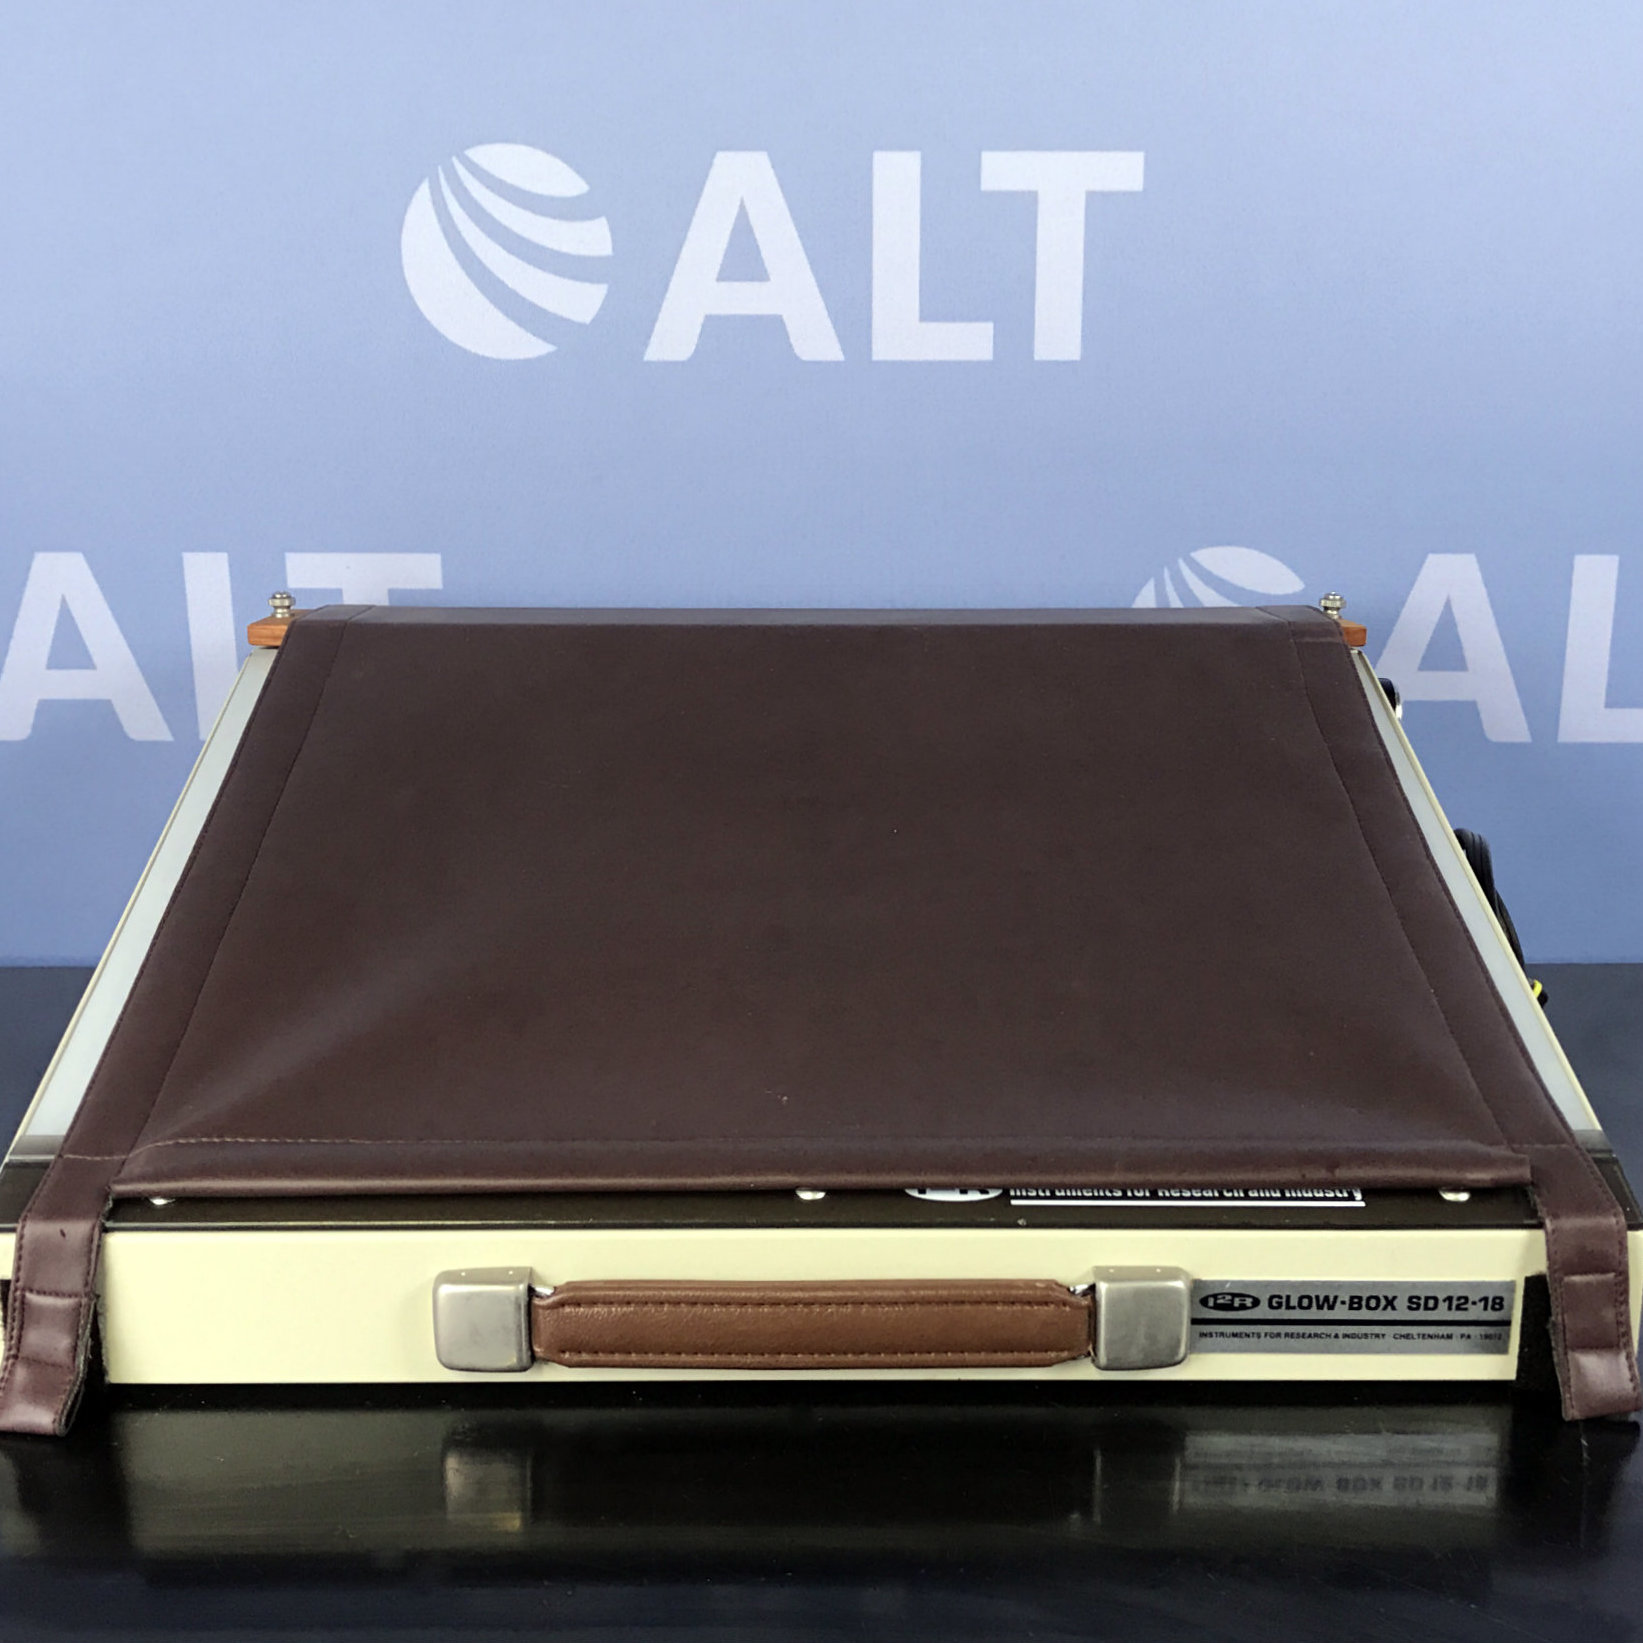 I2R Instruments Glow-Box S 12-18 Image